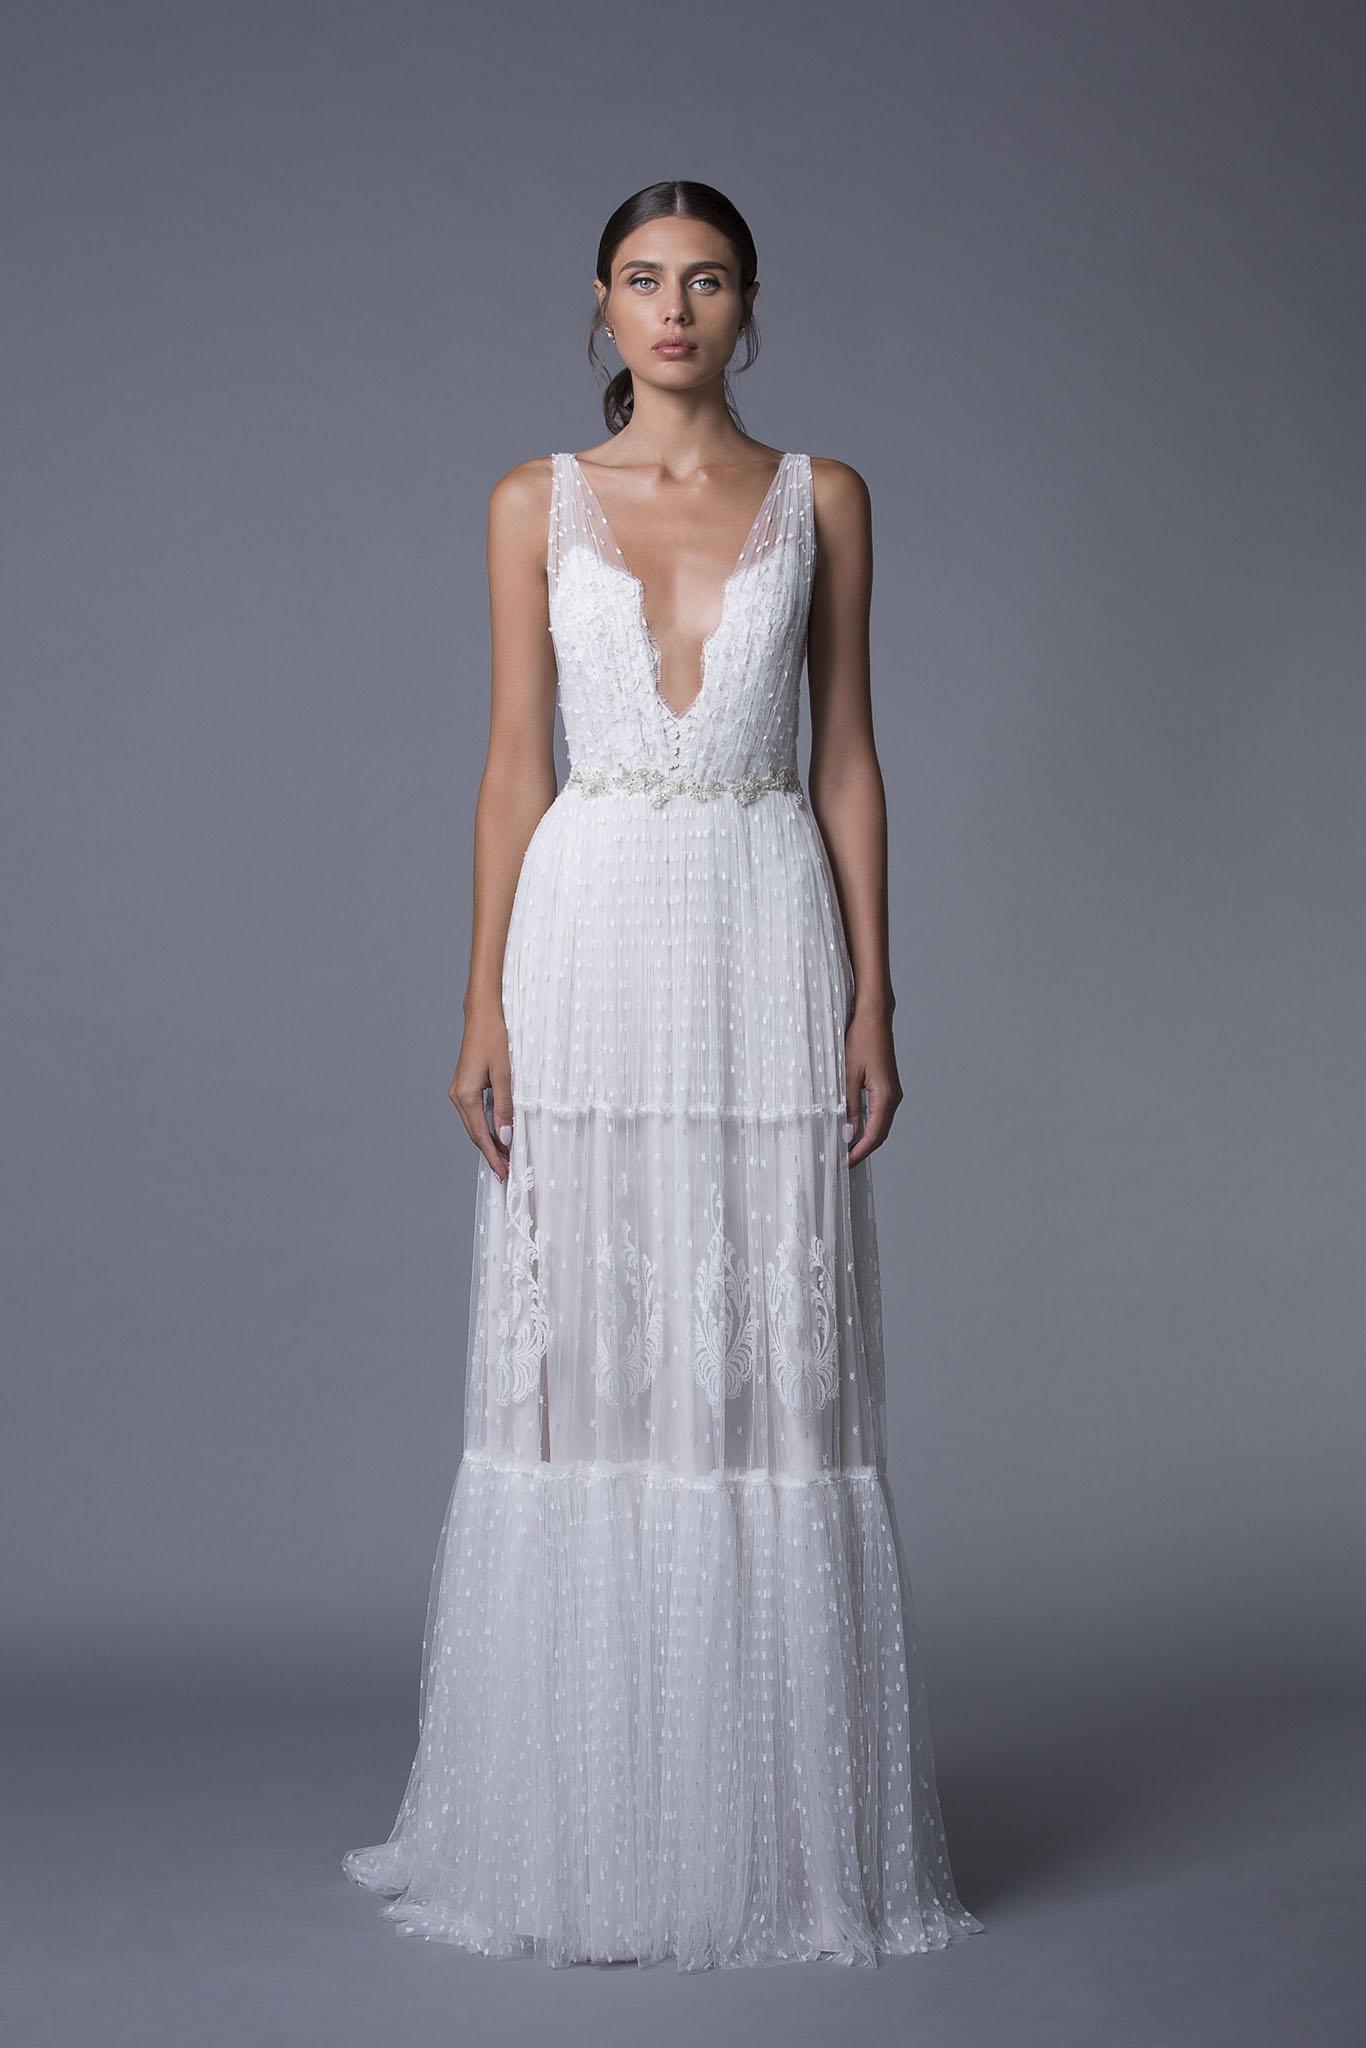 Wedding couture dresses sydney